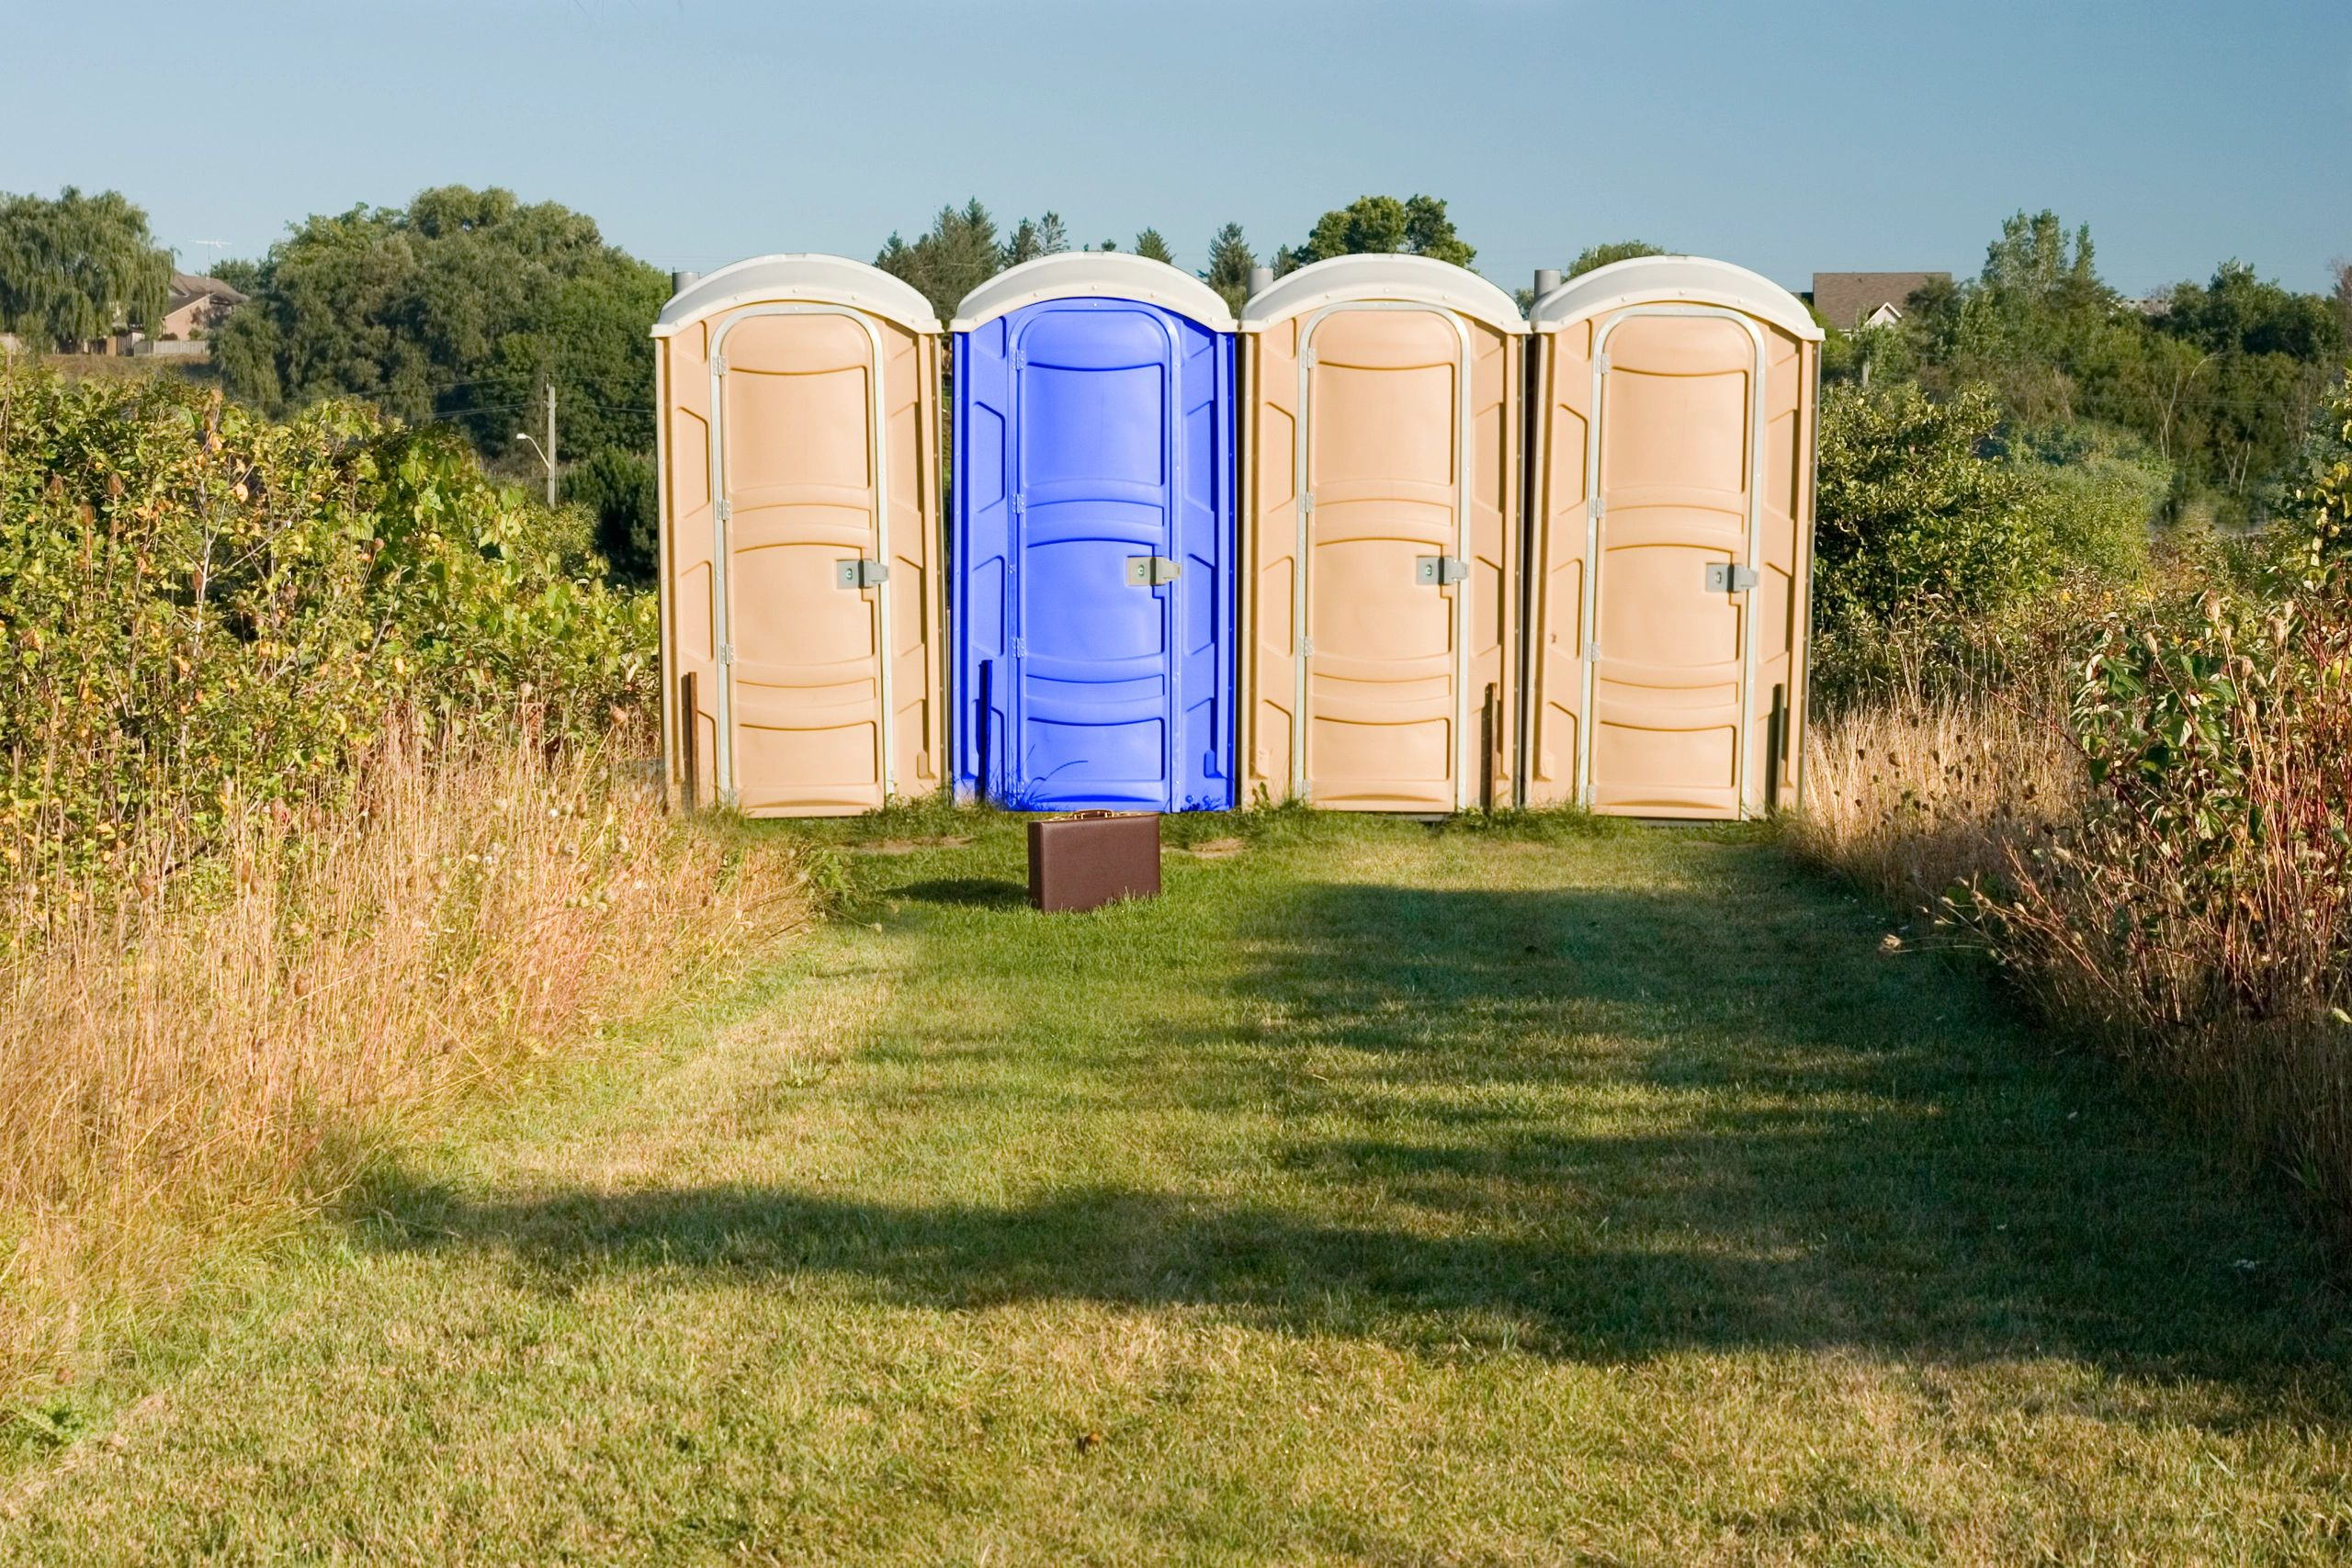 Portable Toilet Rentals, Porta Potty Rentals   Baton Rouge, Louisiana